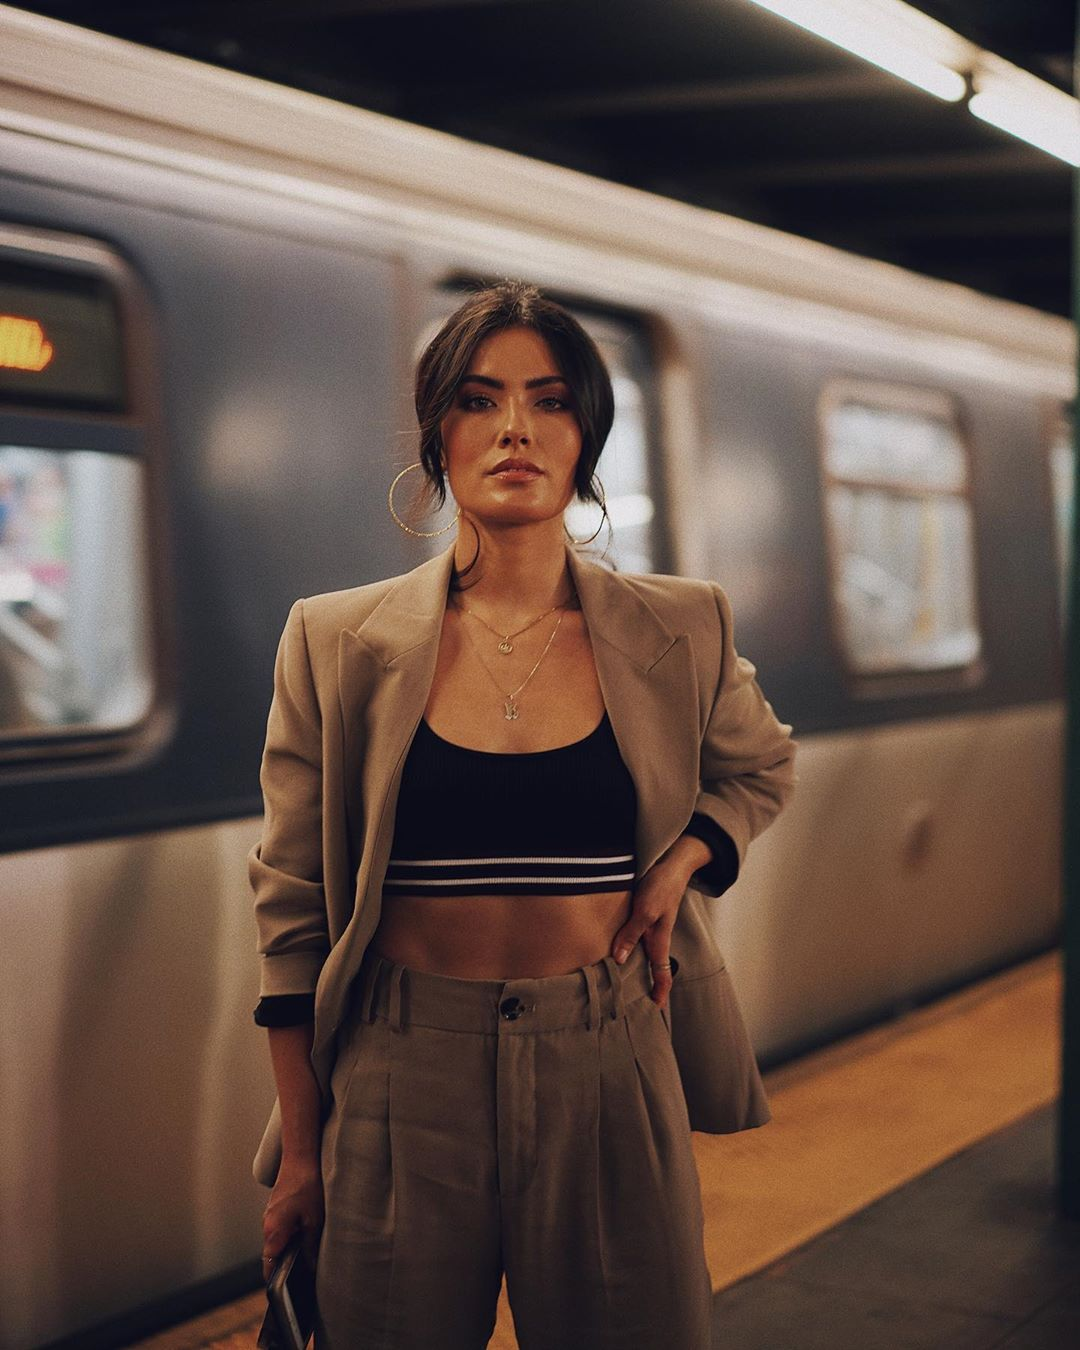 Melissa-Alatorre-Wallpapers-Insta-Fit-Bio-8